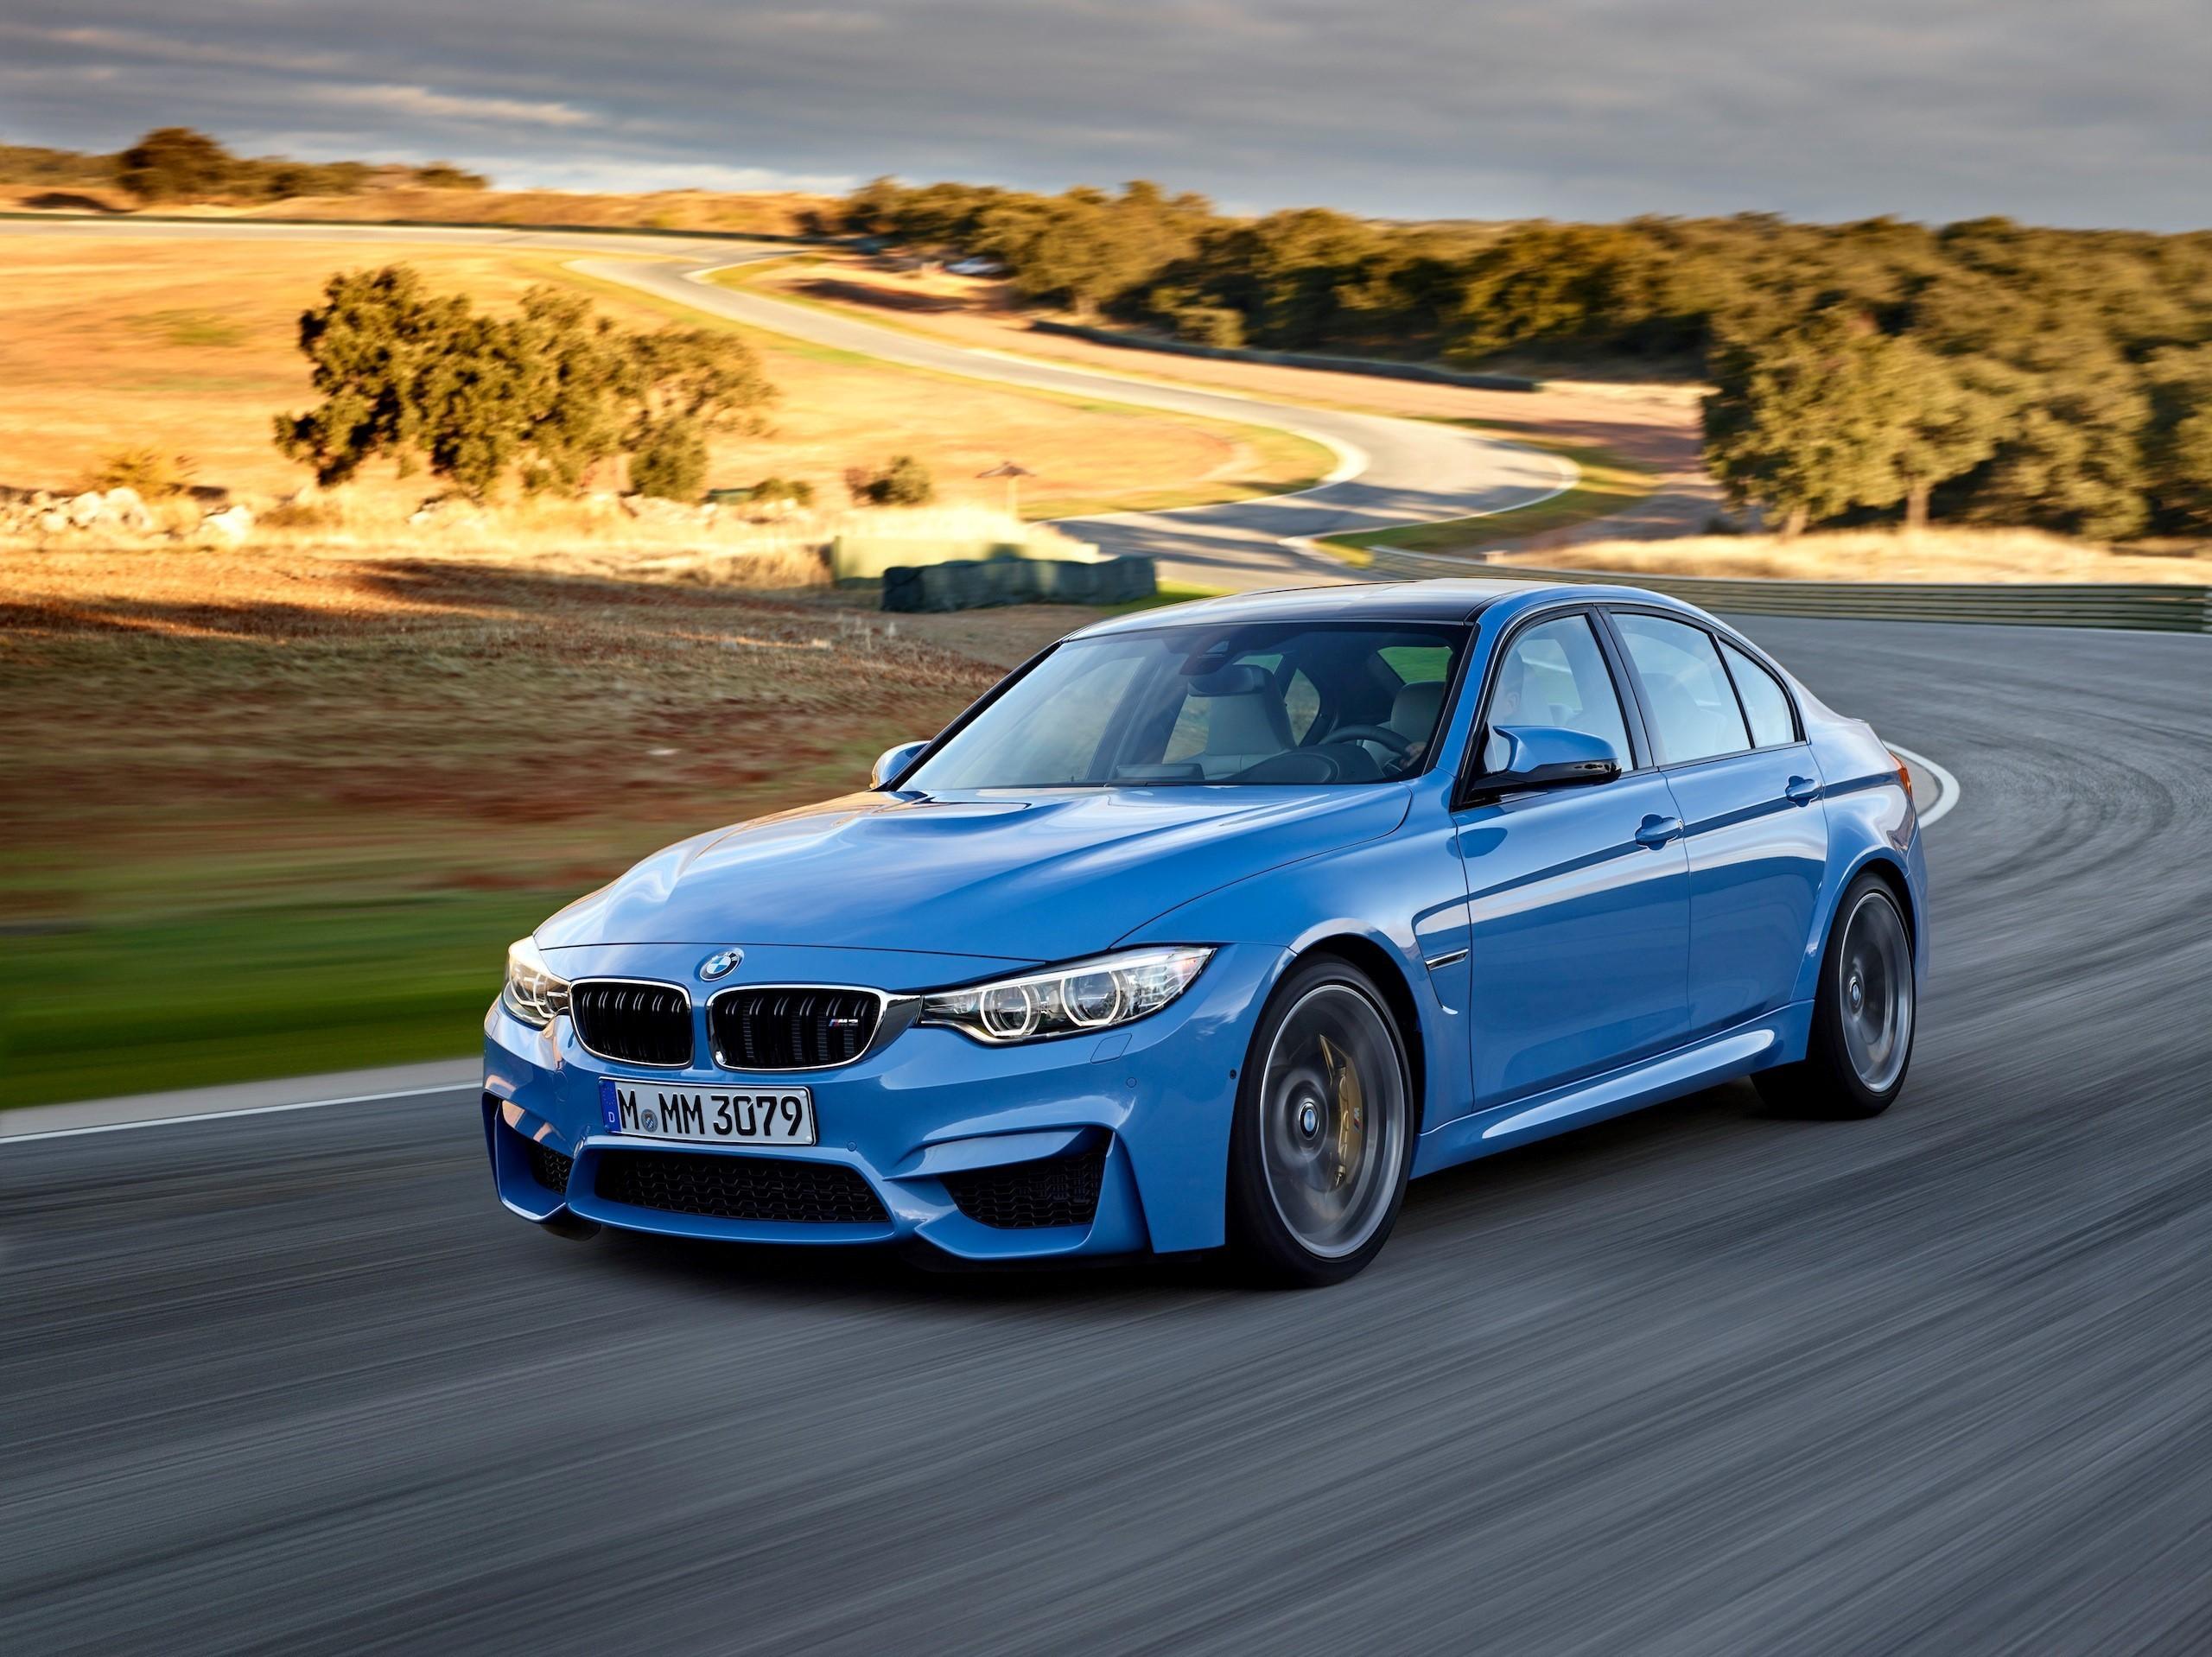 New Blue BMW M3 High Racing Car Wallpaper | HD Wallpapers